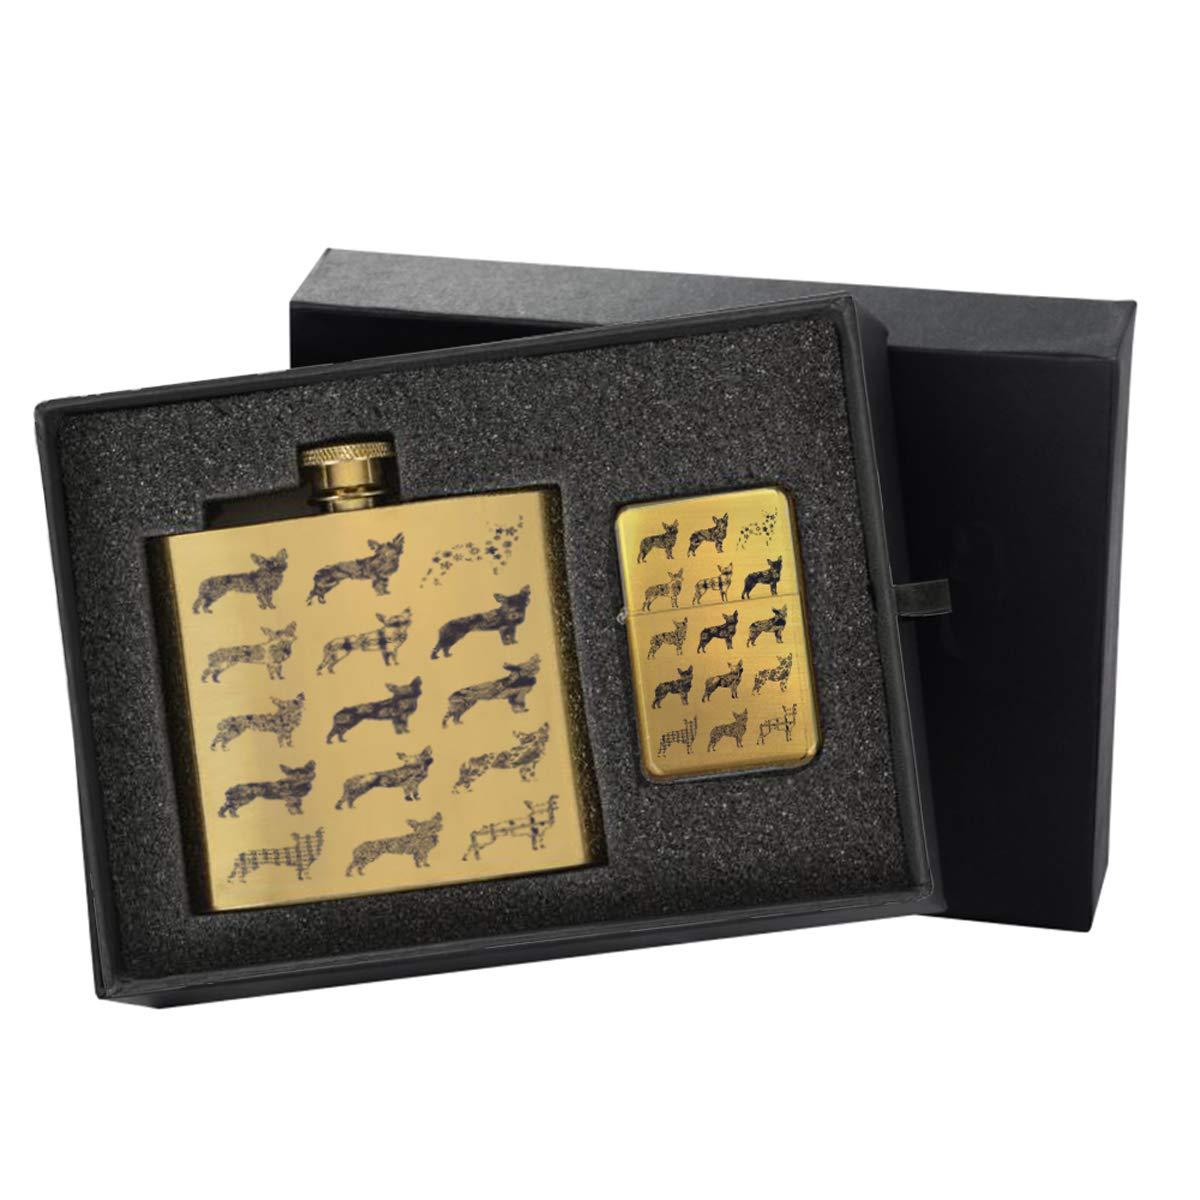 Boston Terrier Tribal - Gold Lighter and Pocket Hip Liquor Flask Survival Camping Gift Box Set